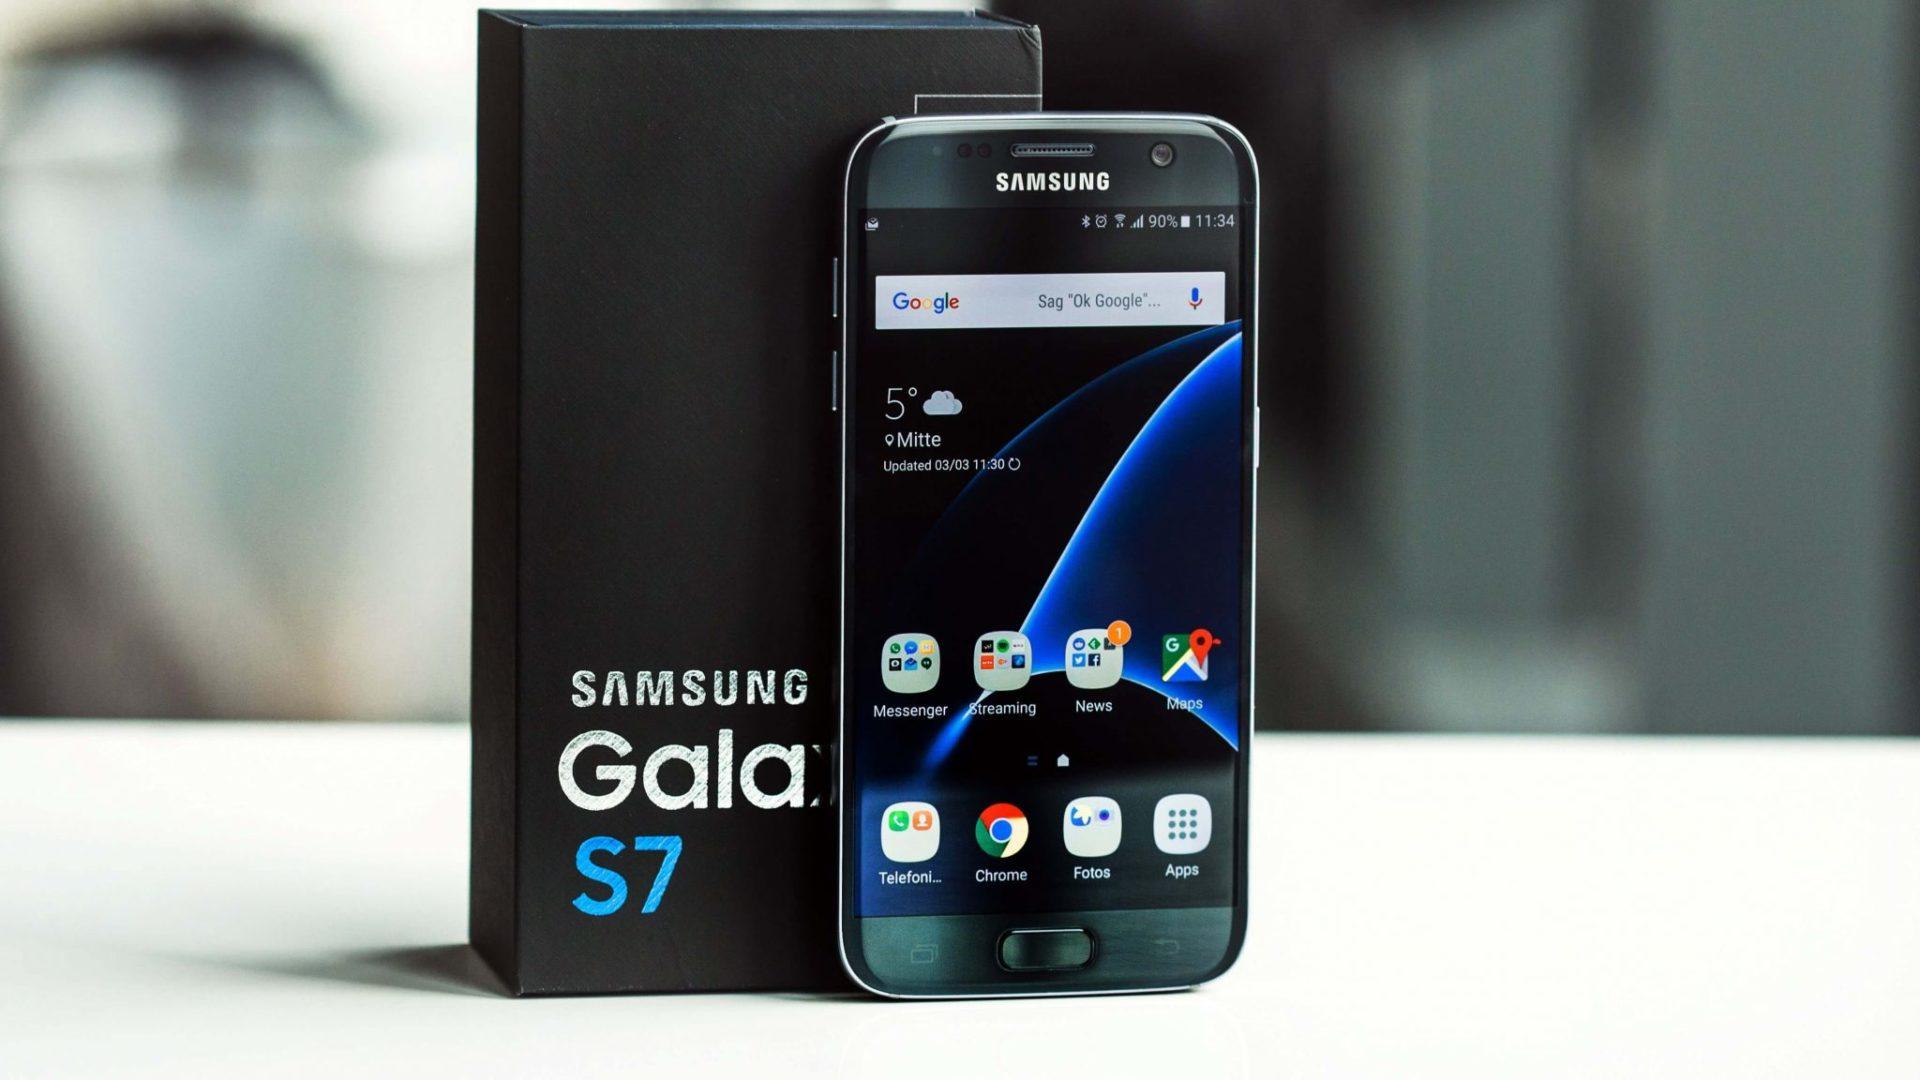 Samsung Galaxy S7 Price in Kenya